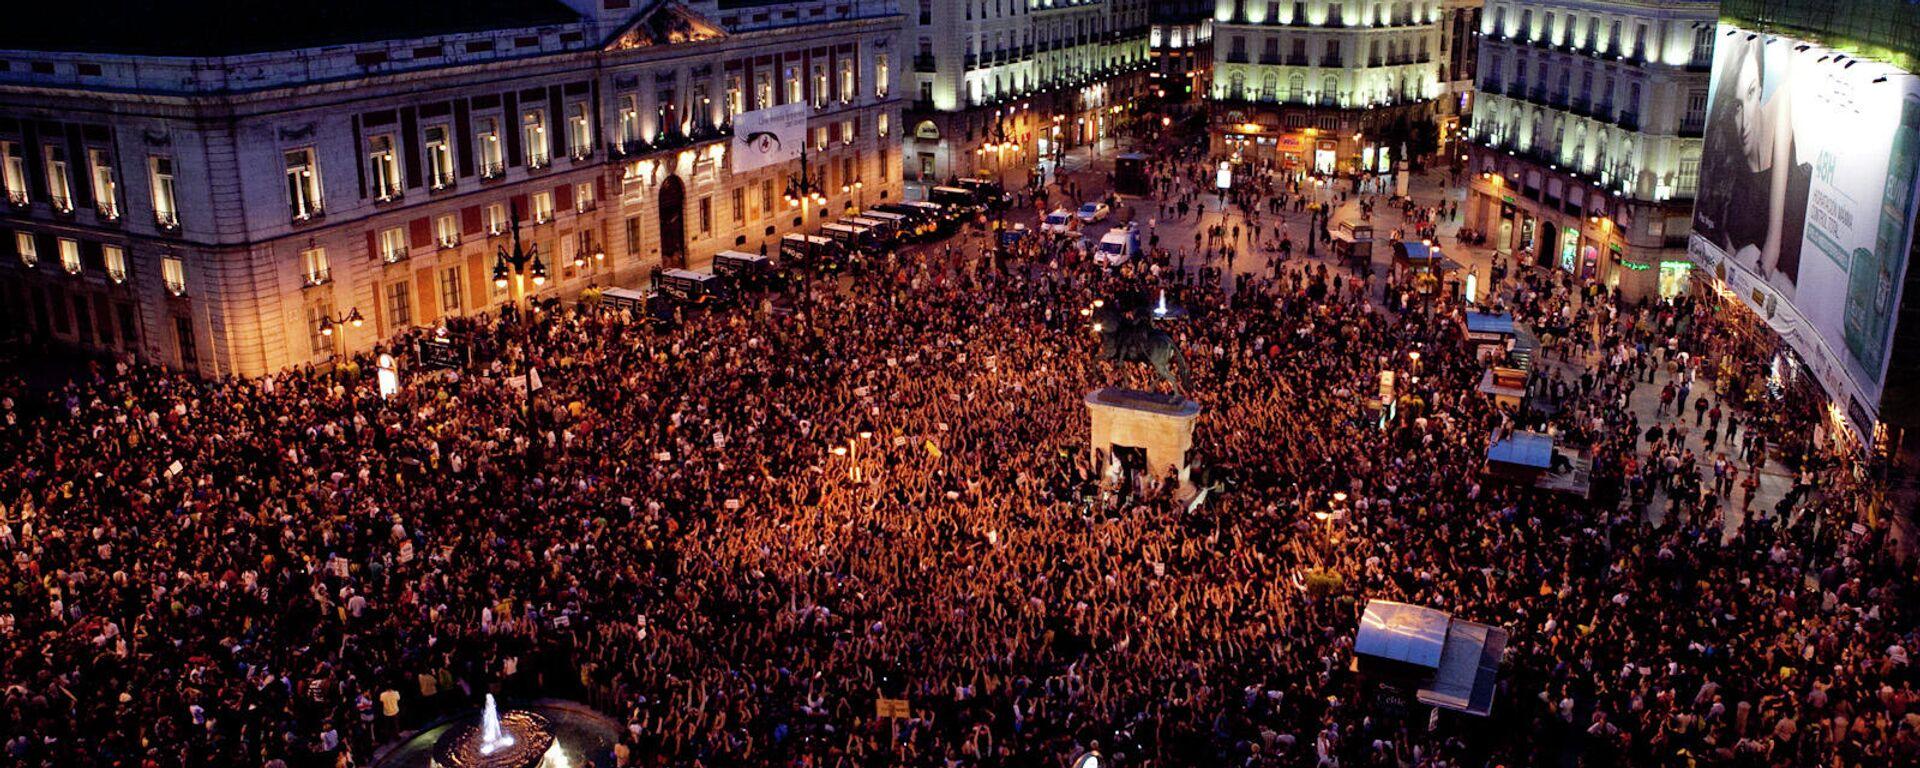 La Puerta del Sol de Madrid, en mayo de 2011 - Sputnik Mundo, 1920, 15.05.2021